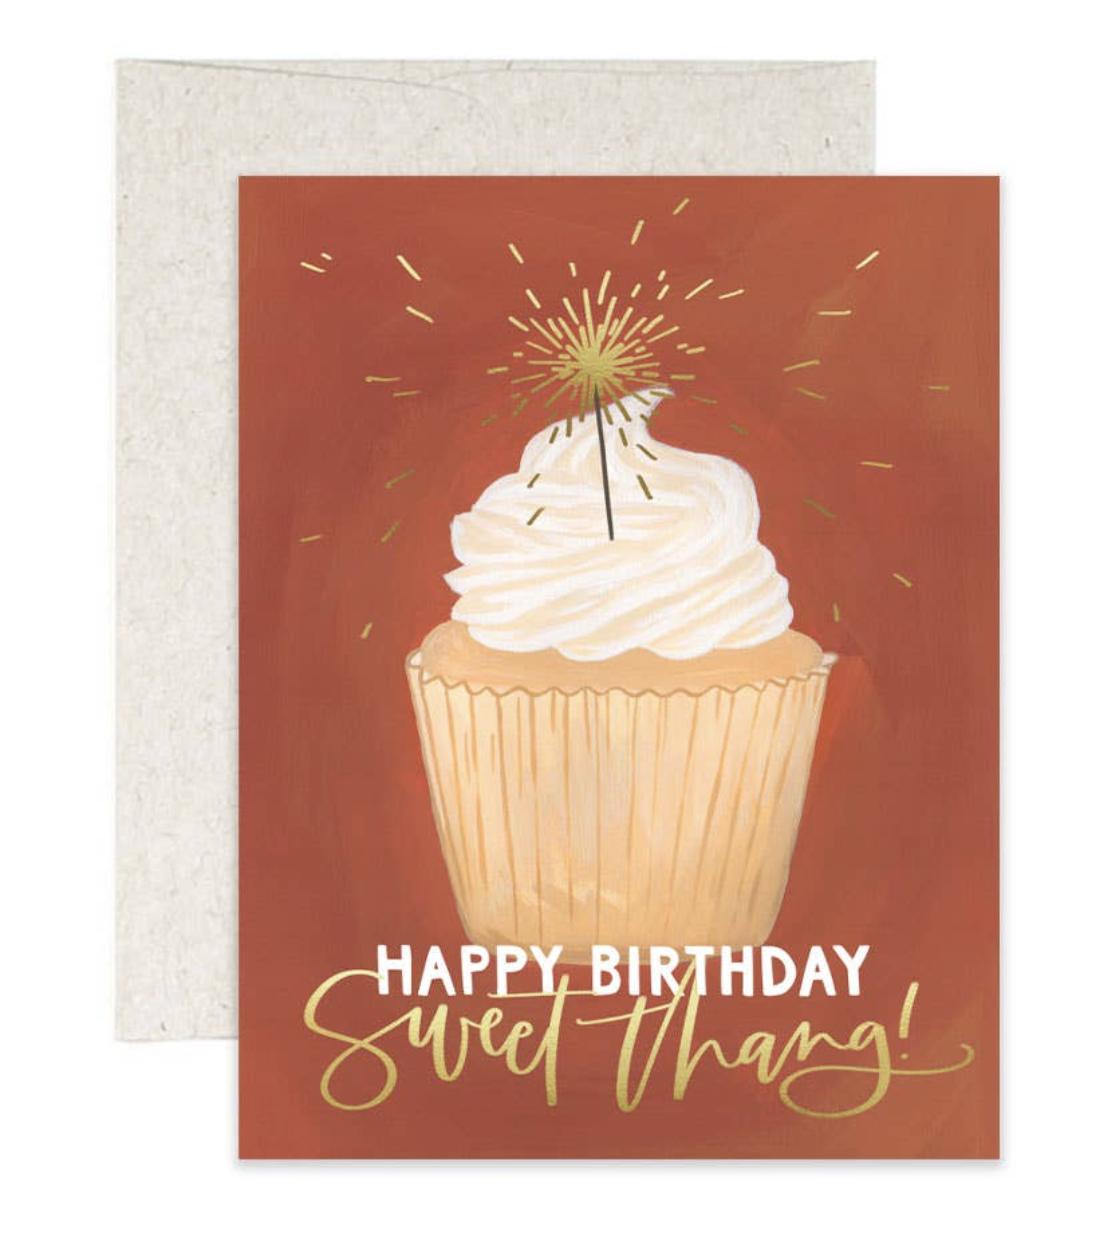 HBD Cupcake, Blank Greeting Card